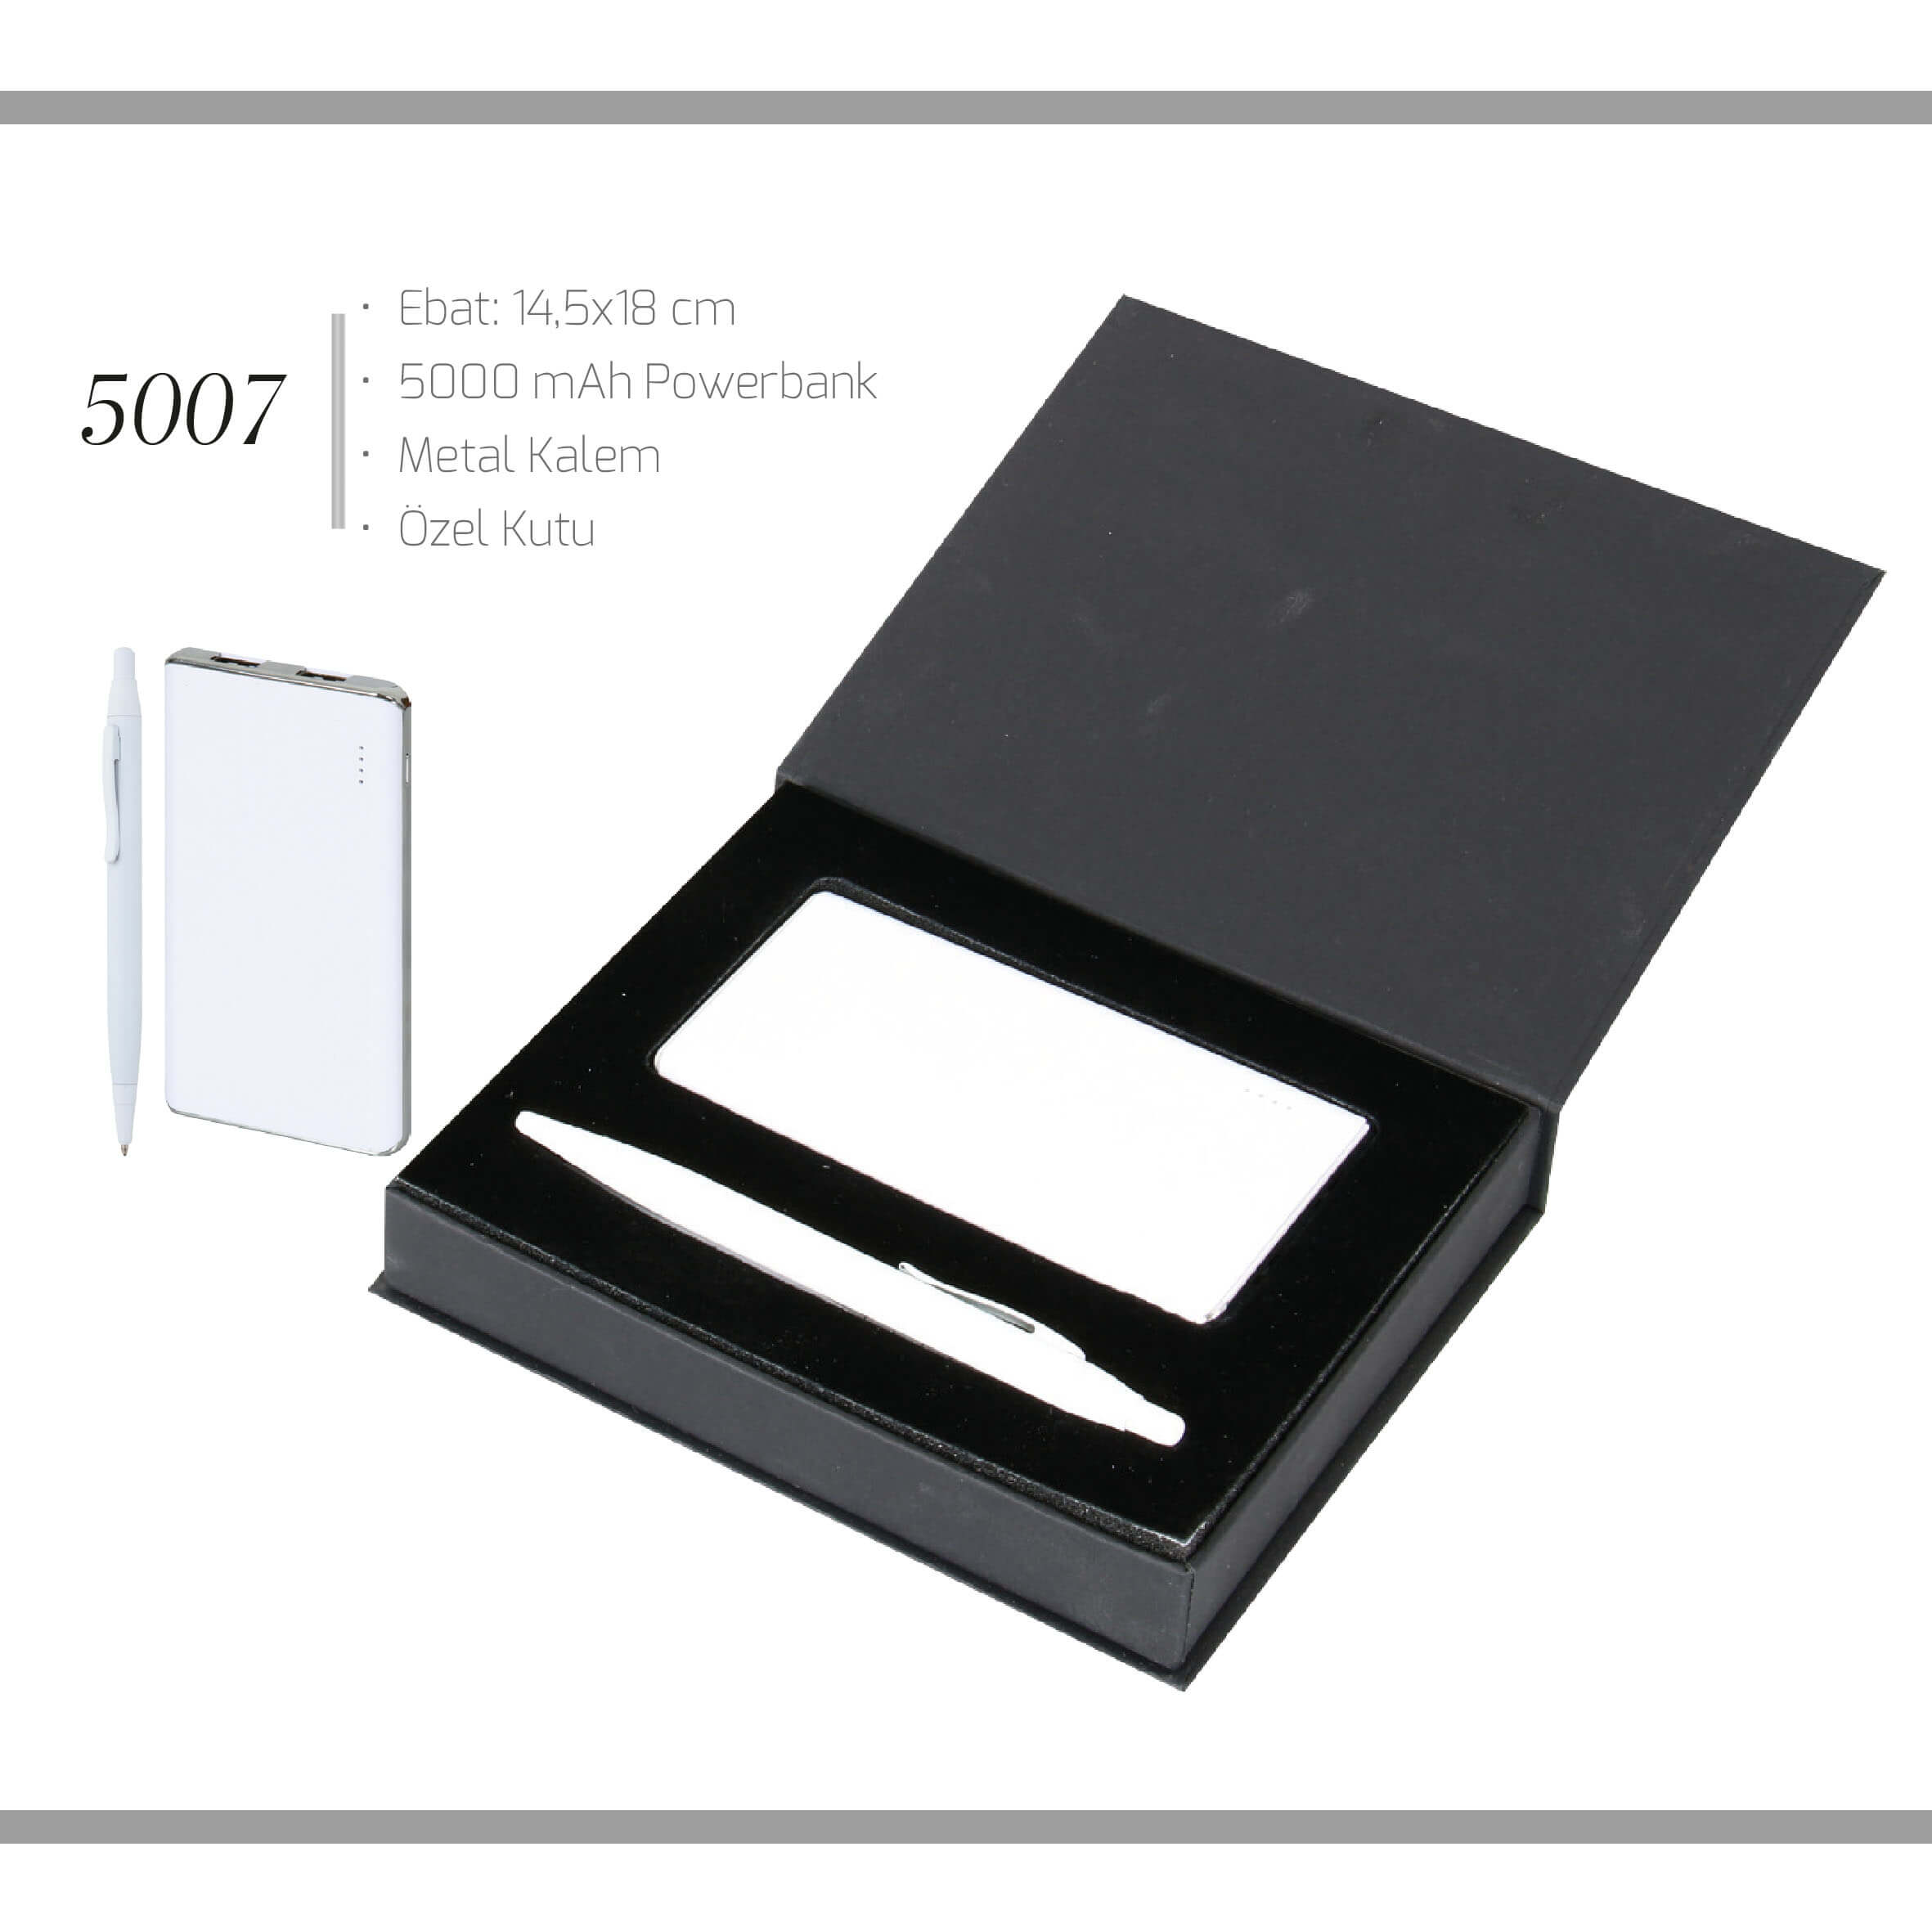 promosyon-promosyon ürünleri-VIP setler-promosyon 5007